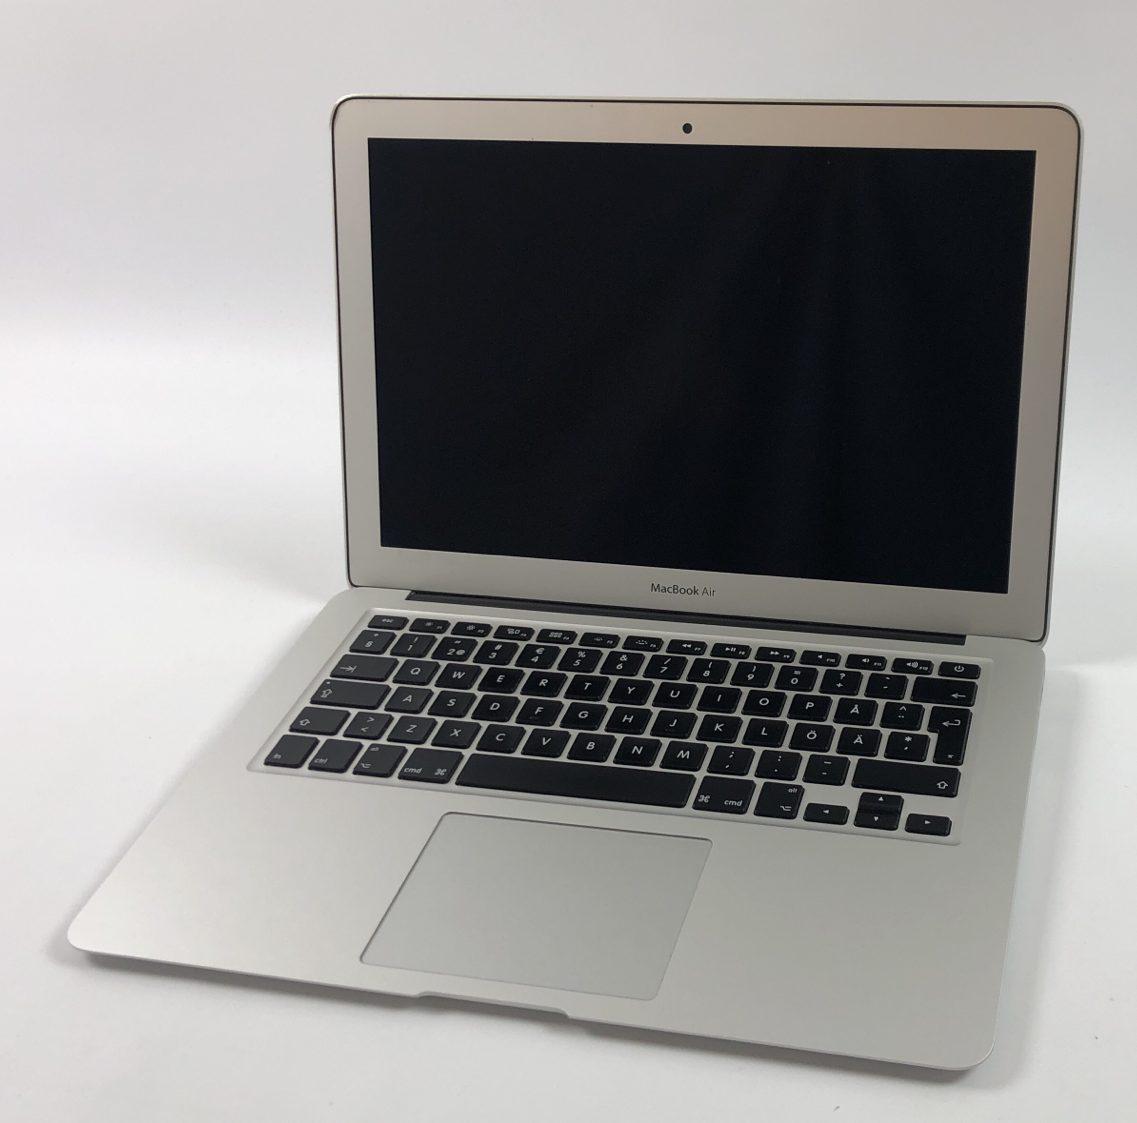 "MacBook Air 13"" Early 2015 (Intel Core i5 1.6 GHz 8 GB RAM 128 GB SSD), Intel Core i5 1.6 GHz, 8 GB RAM, 128 GB SSD, bild 1"